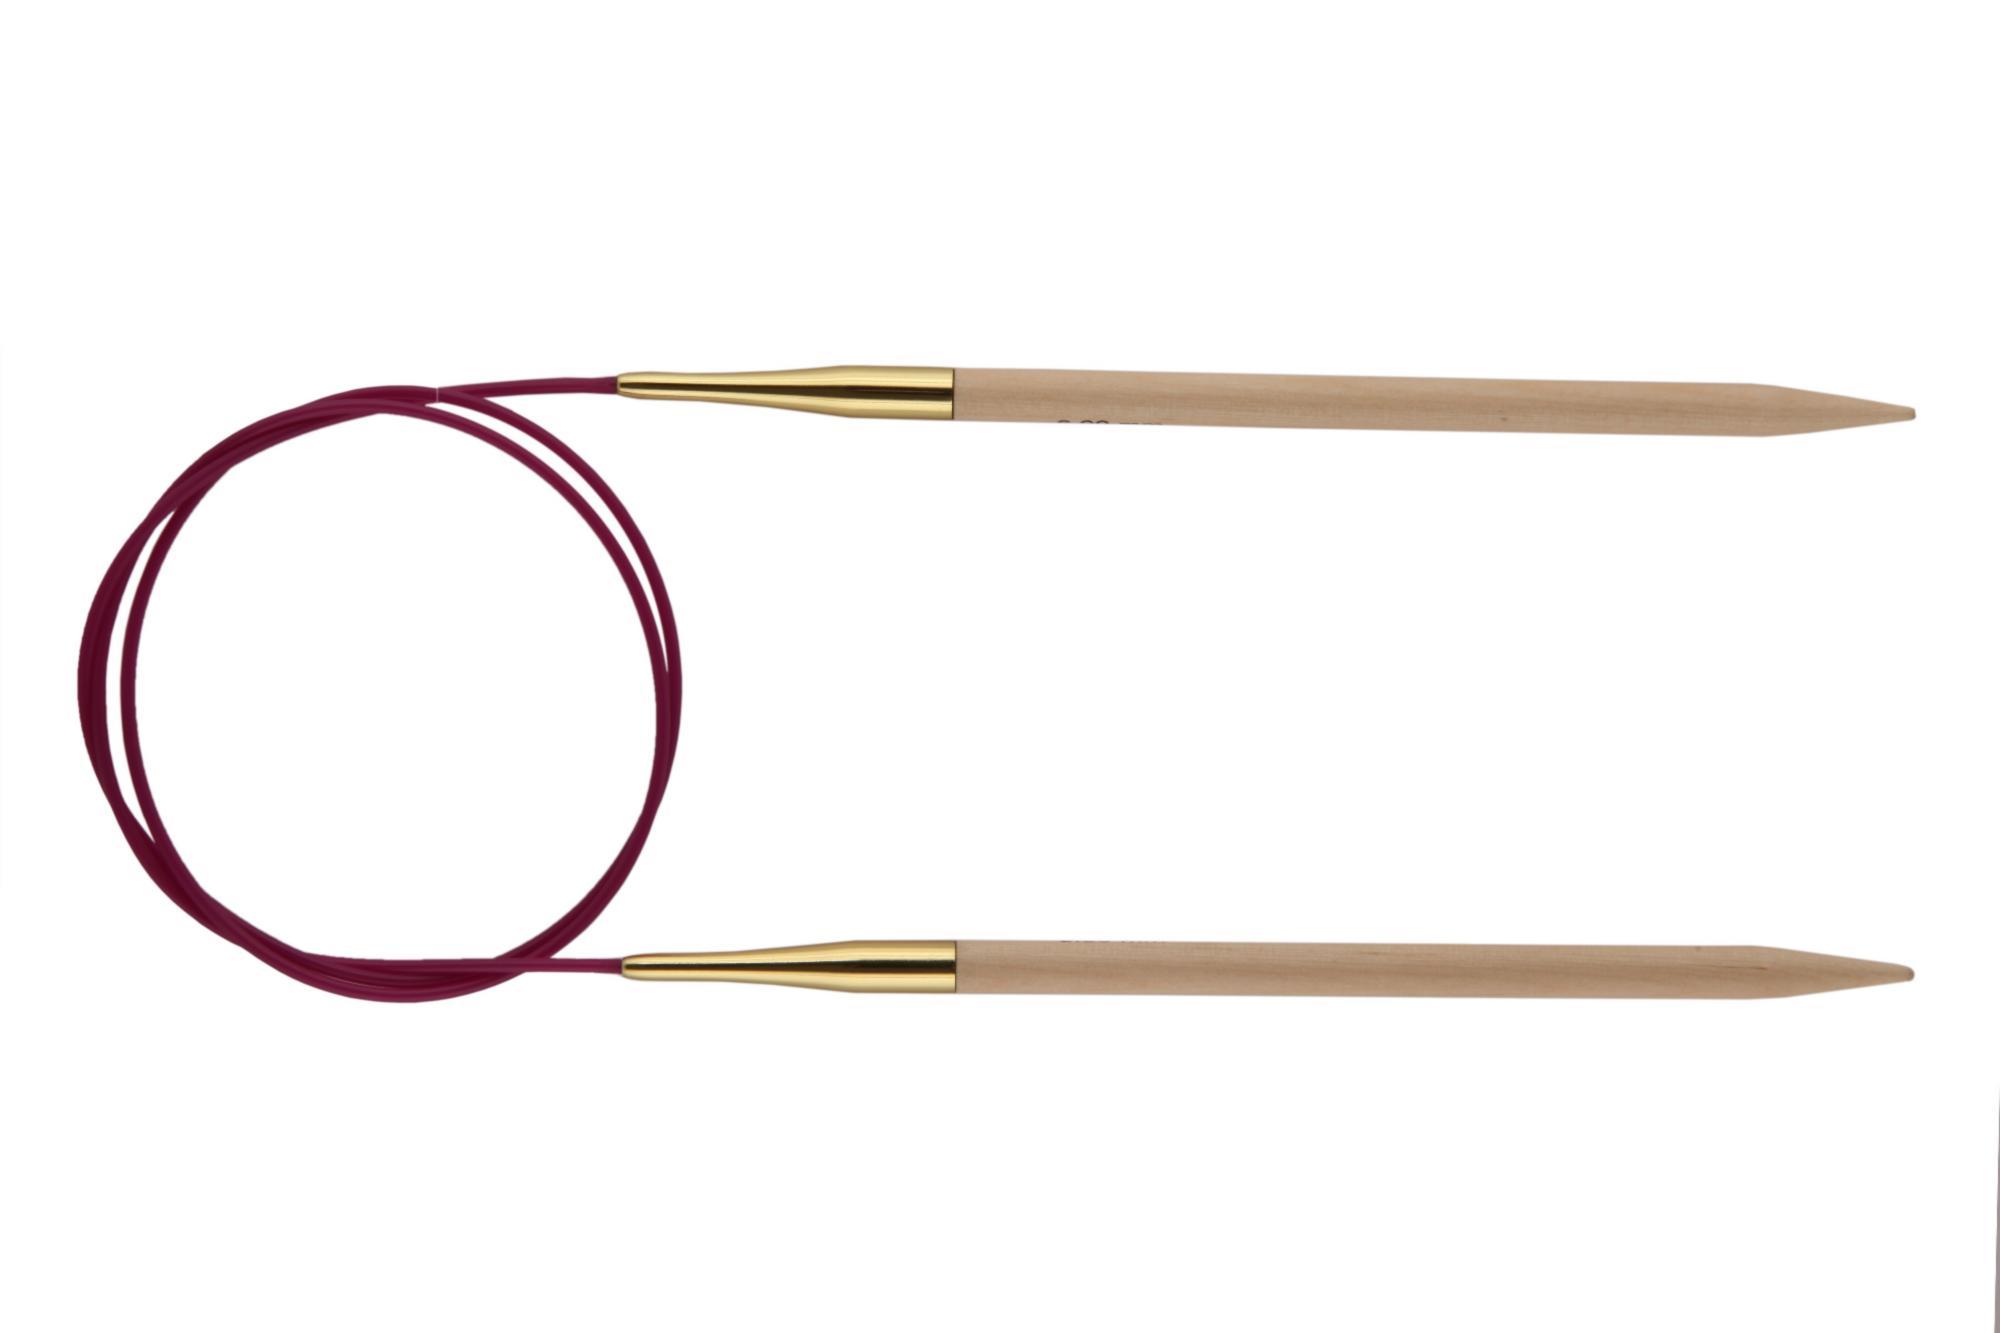 Спицы круговые 120 см Basix Birch Wood KnitPro, 35401, 3.25 мм